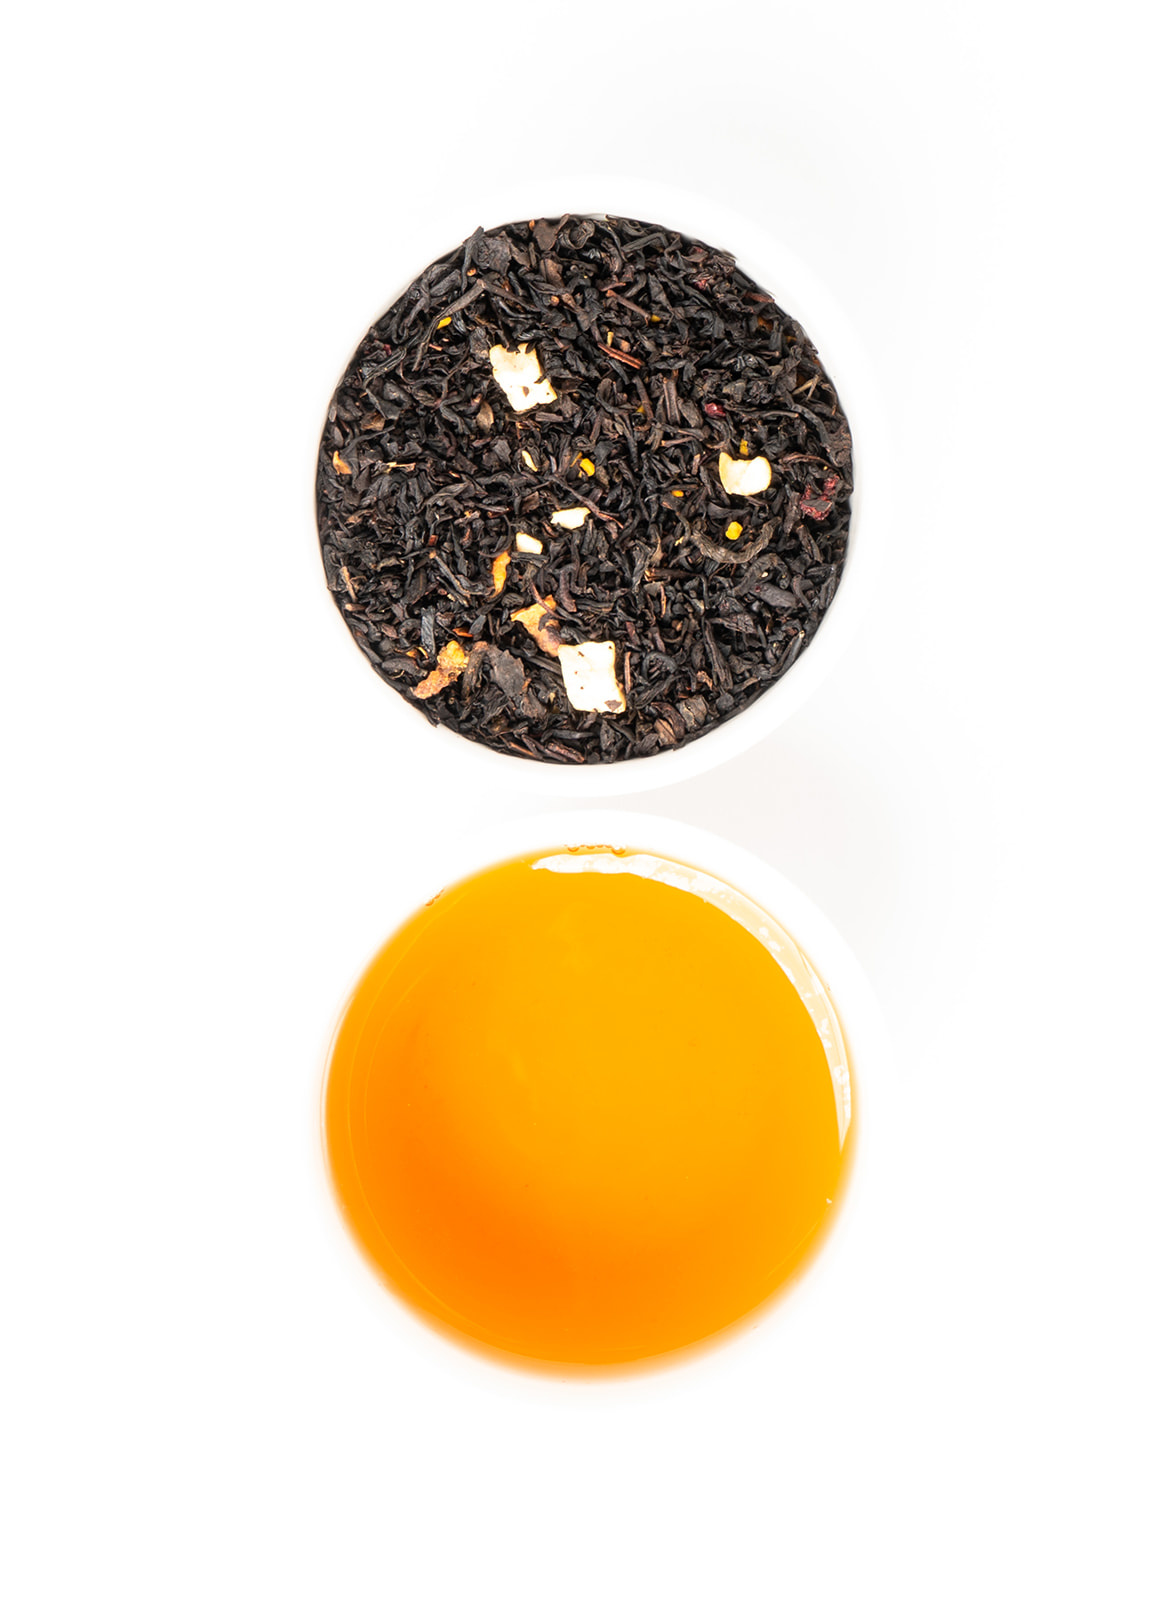 Hey Honey - black tea